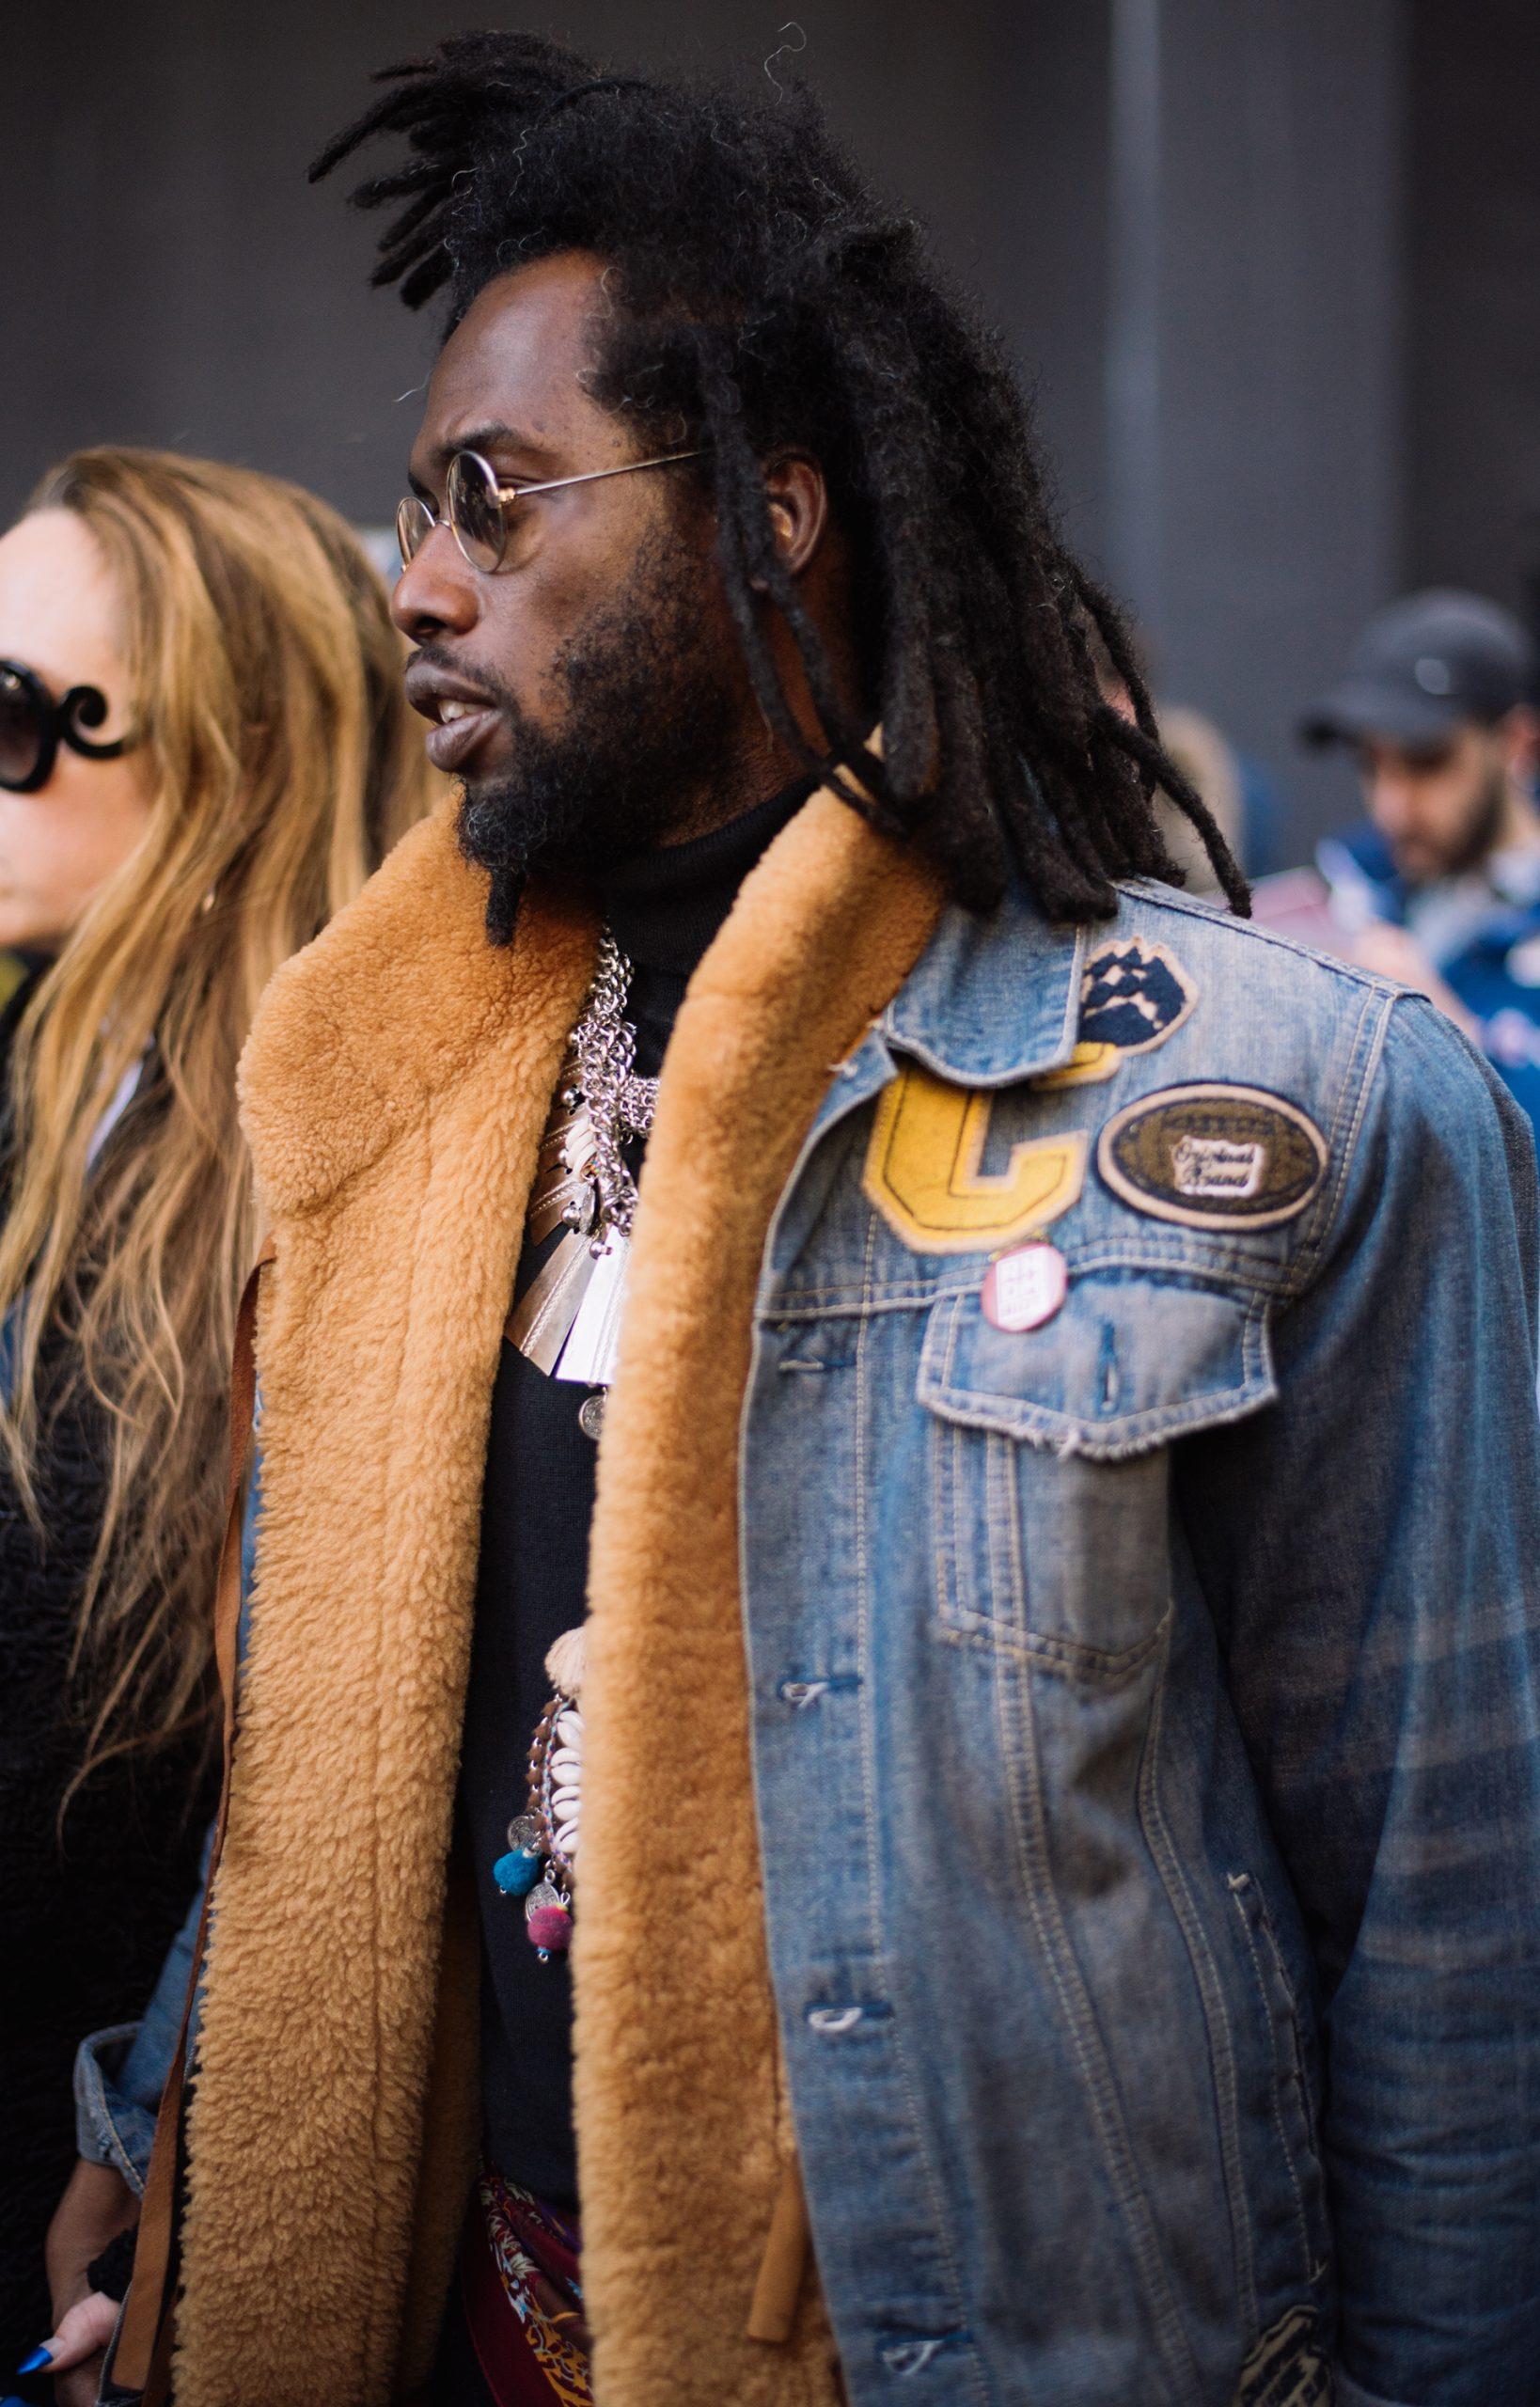 milano fashion week, iceberg, fw19, street style